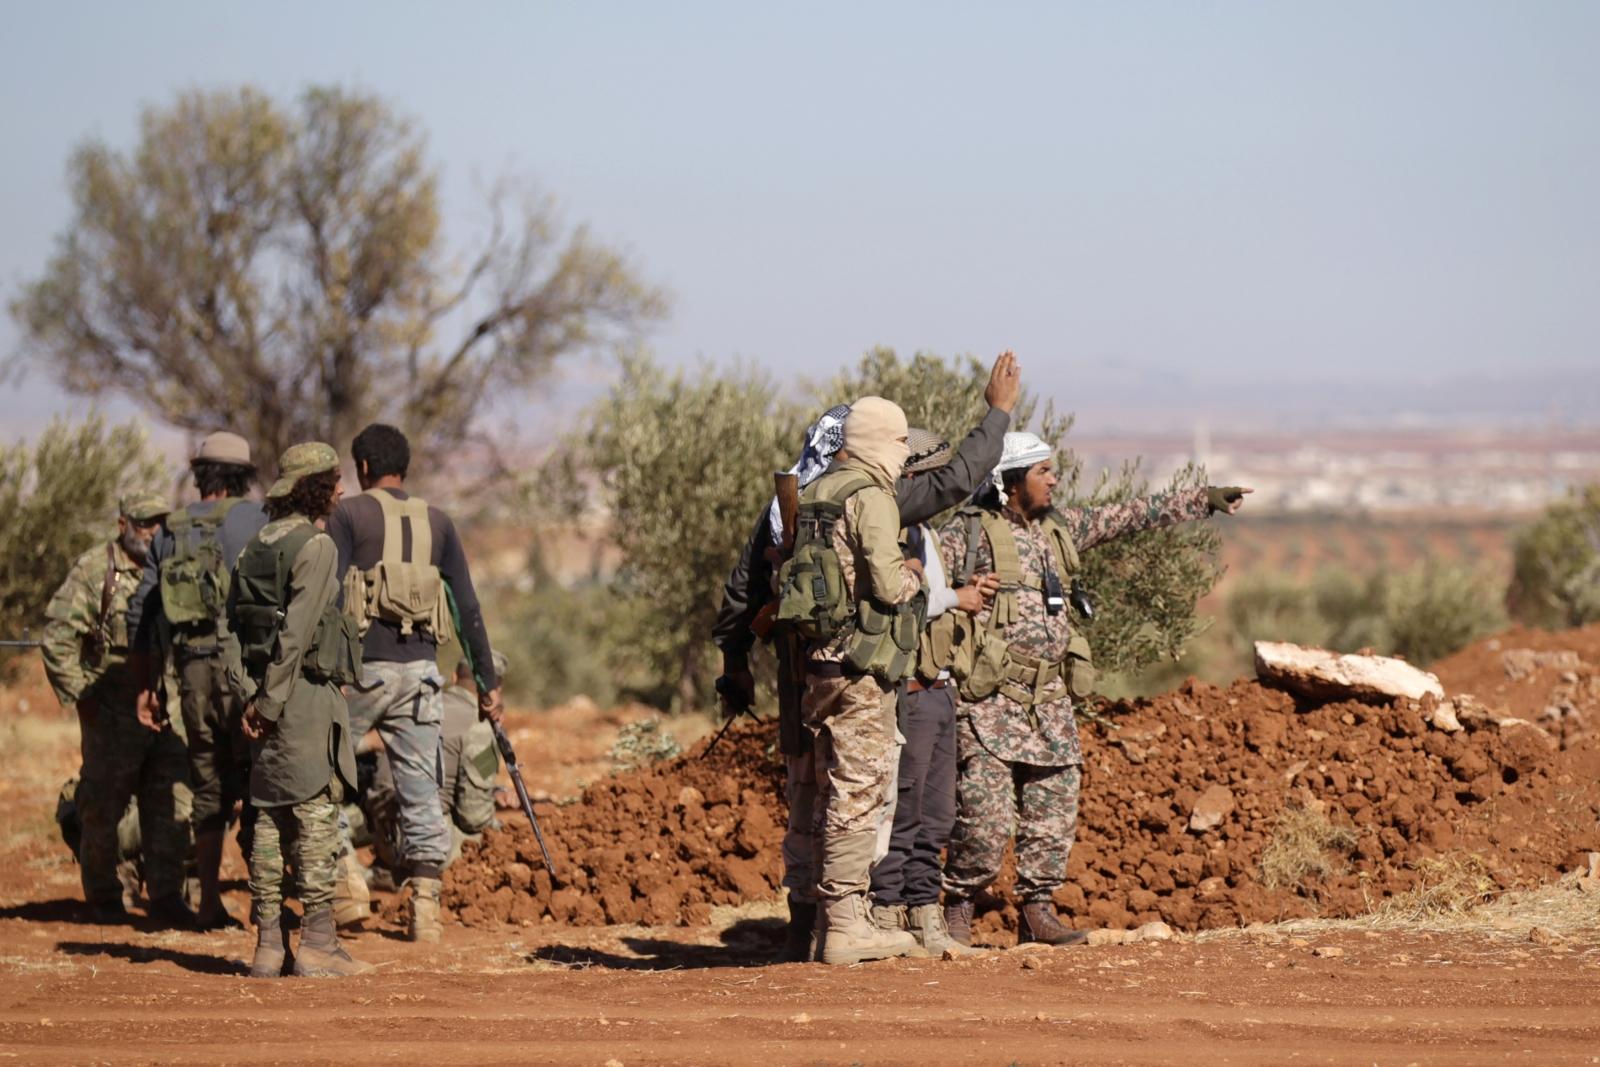 rebels in Syria's al-Bab